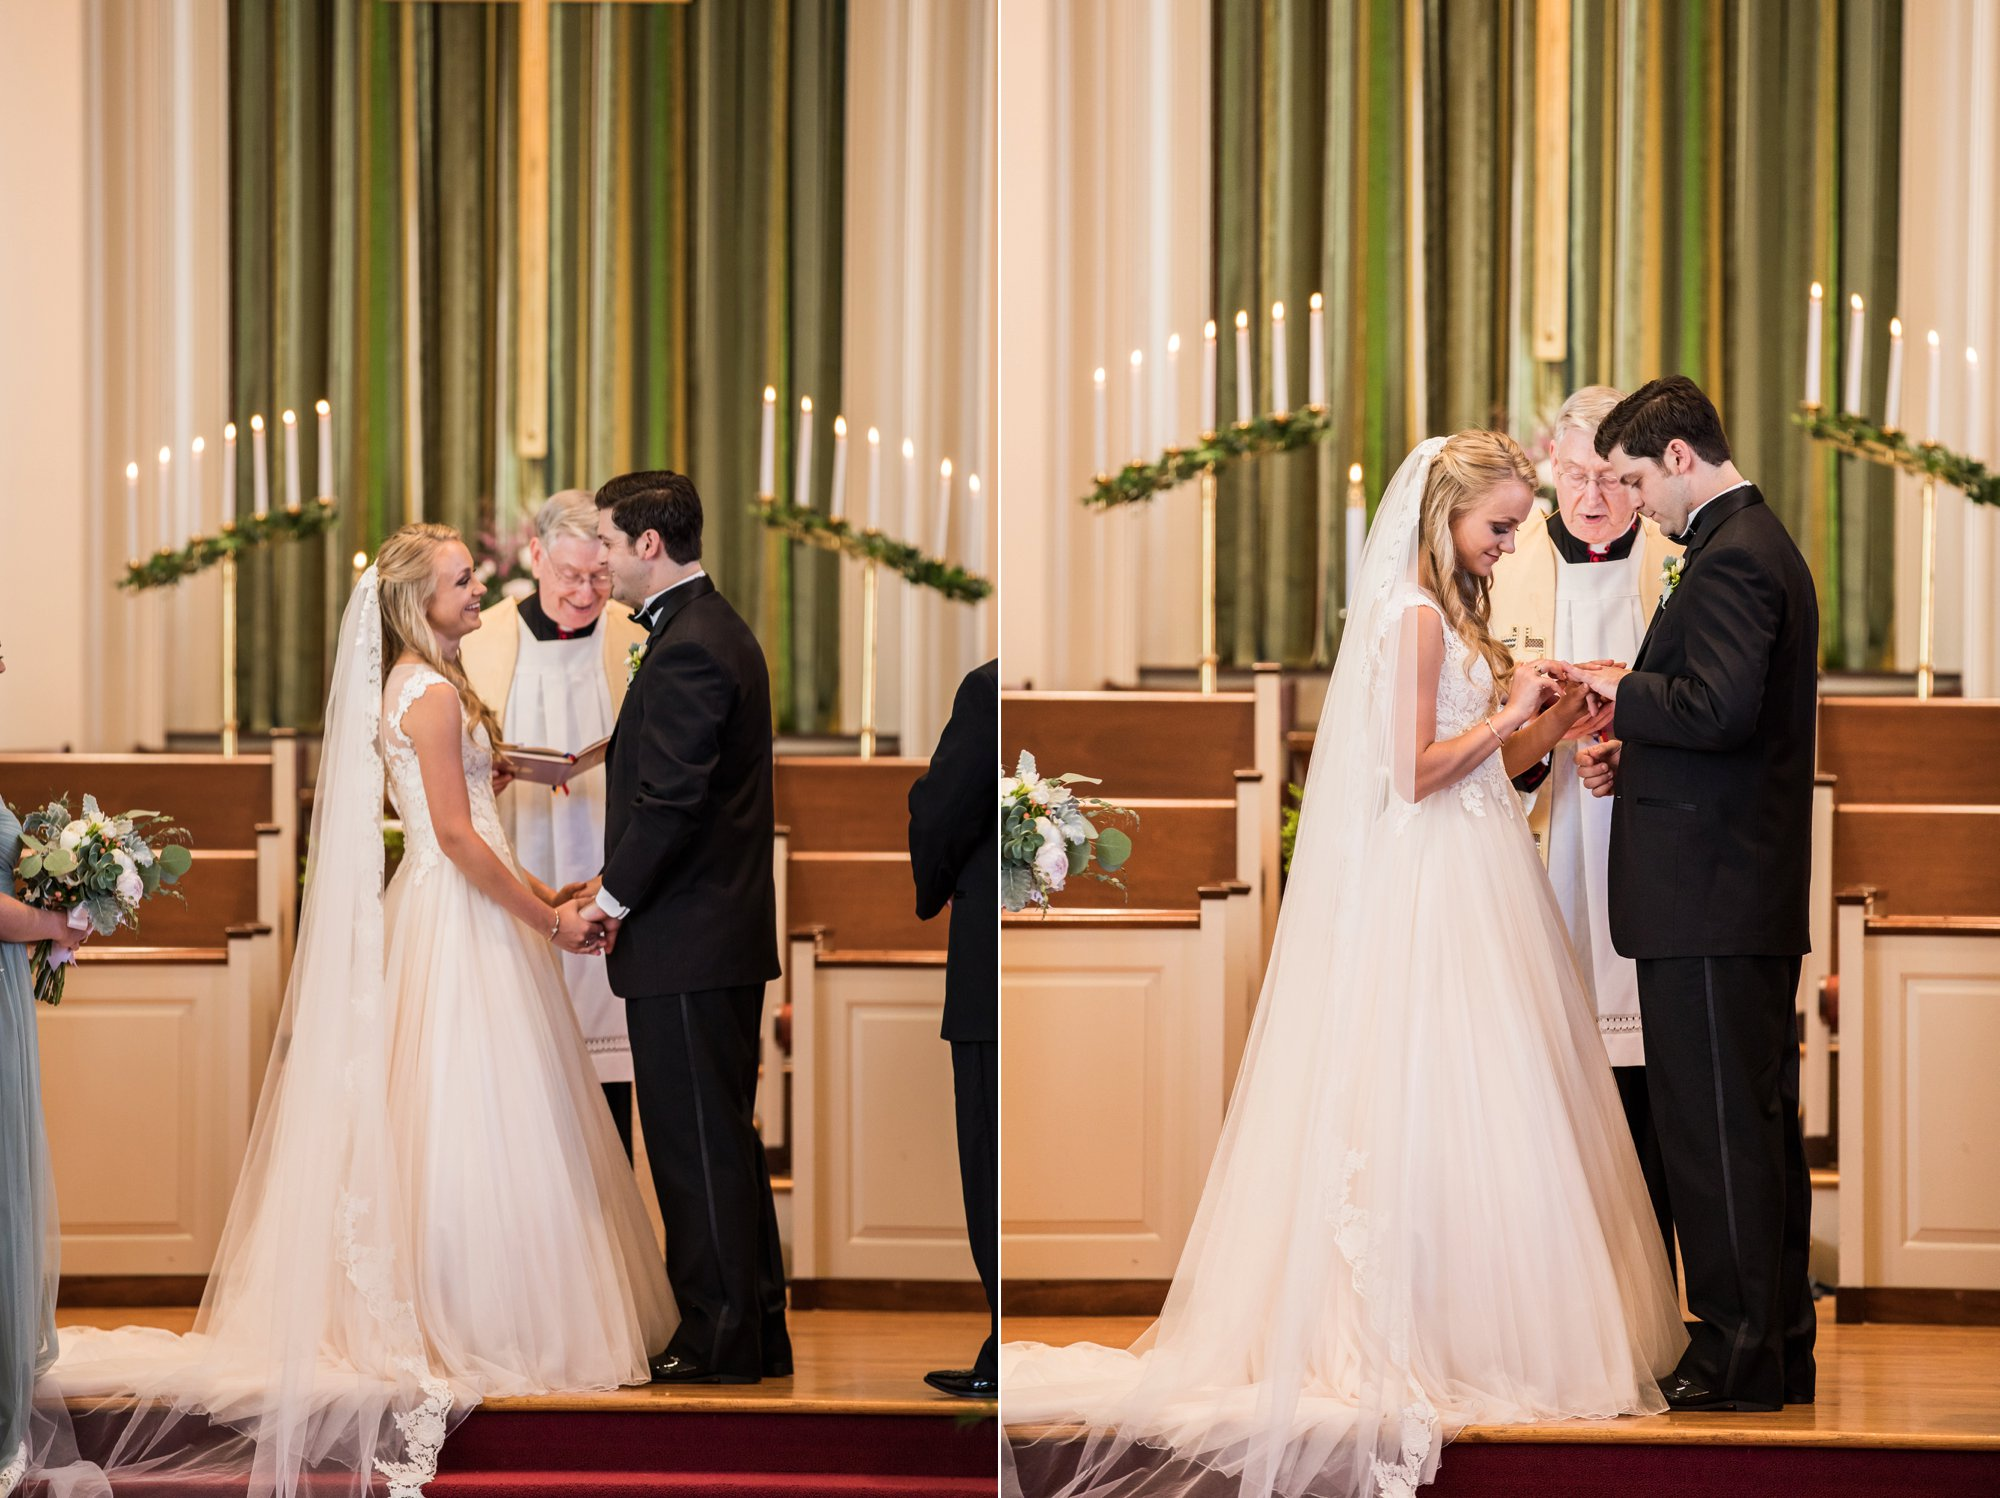 wedding-photography-88-love-stories_0028.jpg